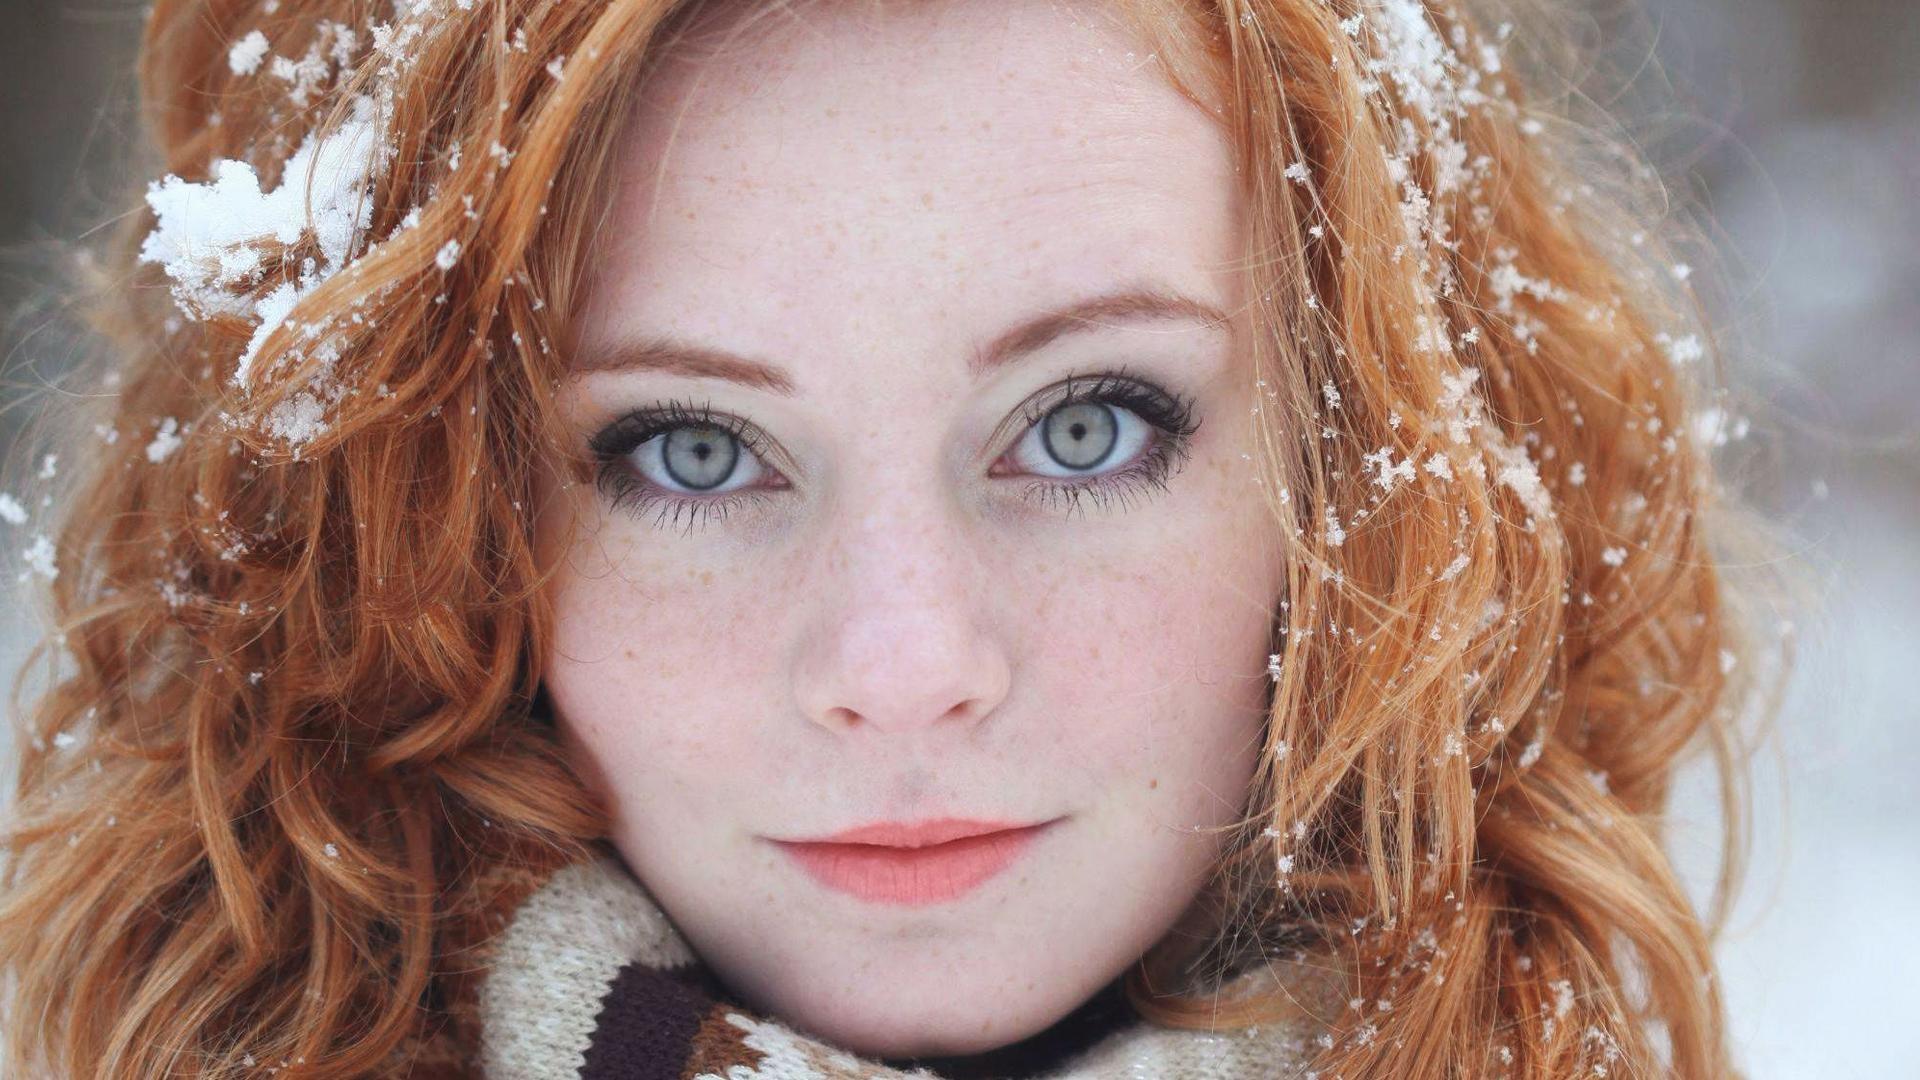 Explore Beautiful Redhead, Beautiful People, and more!